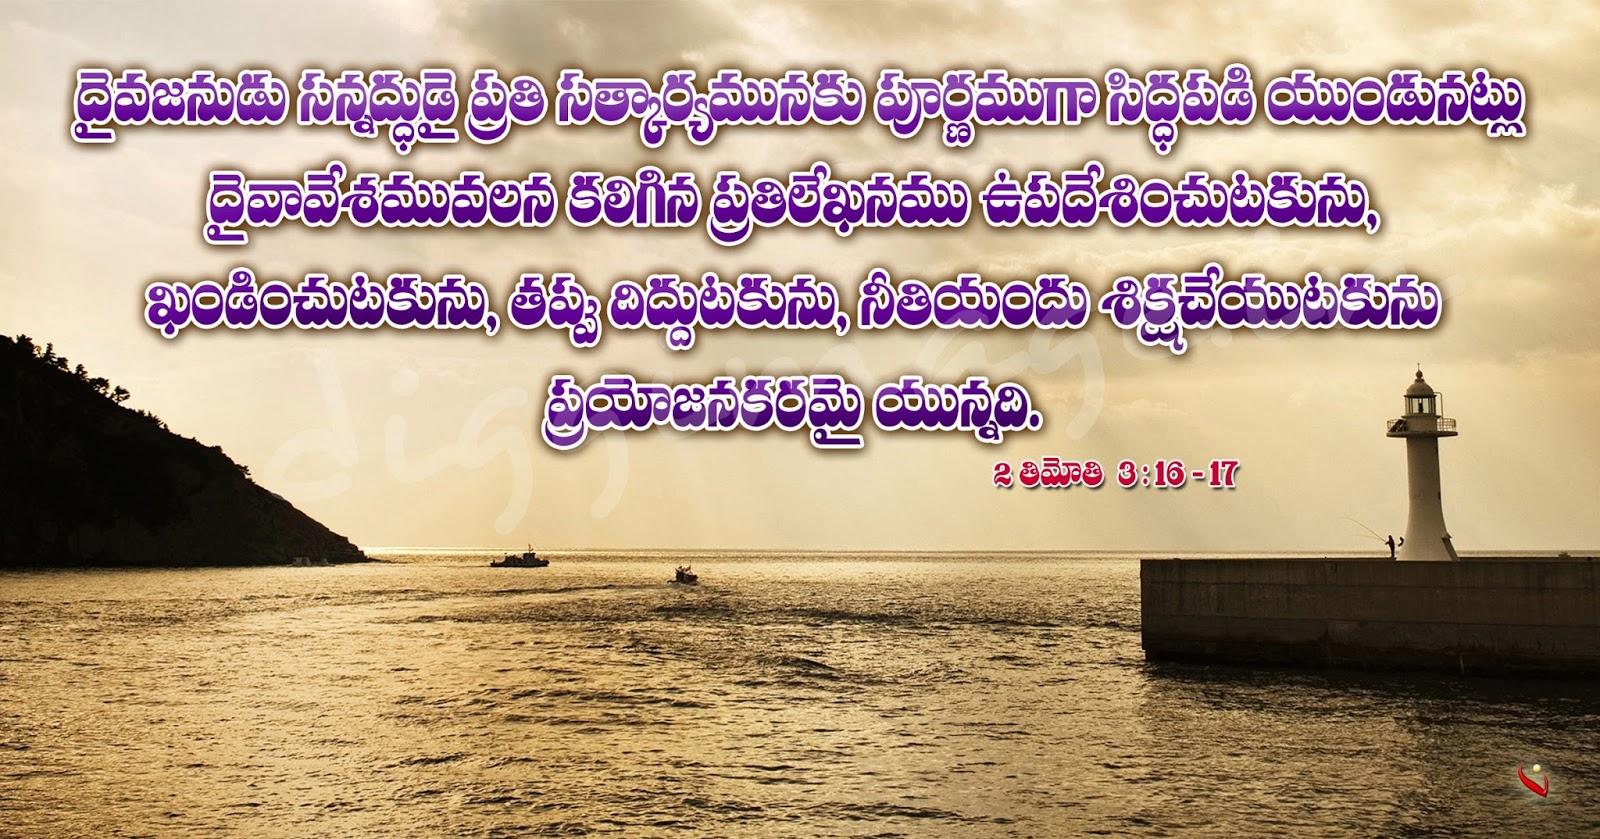 Beautiful Telugu Christian Bible Verse, Bible Verse Wallpapers in Telugu, Bible Vakyamulu Telugu, ... Joyful Quotations in Telugu | Beautiful Telugu Quotes